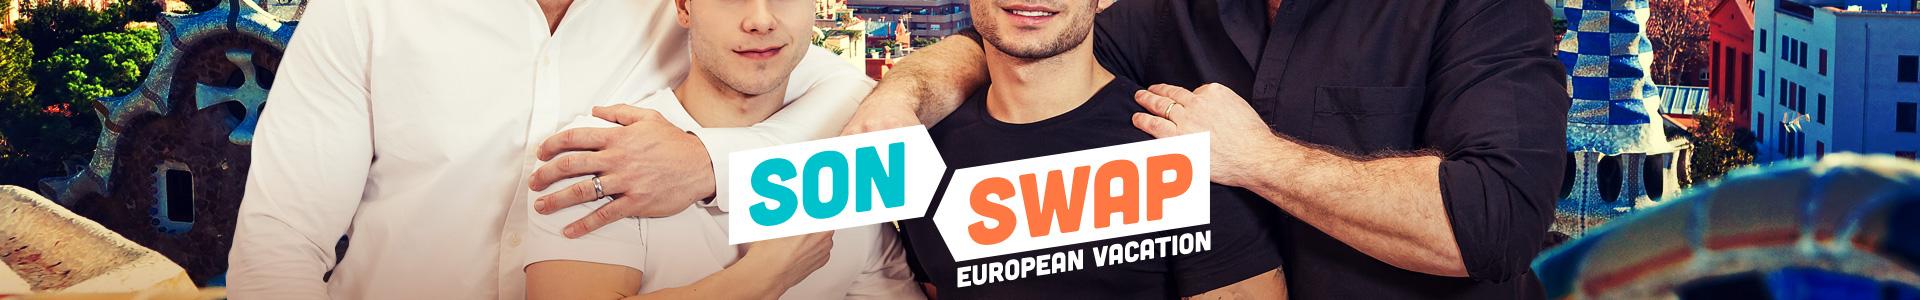 Sonswap_europeanvacation-bottom